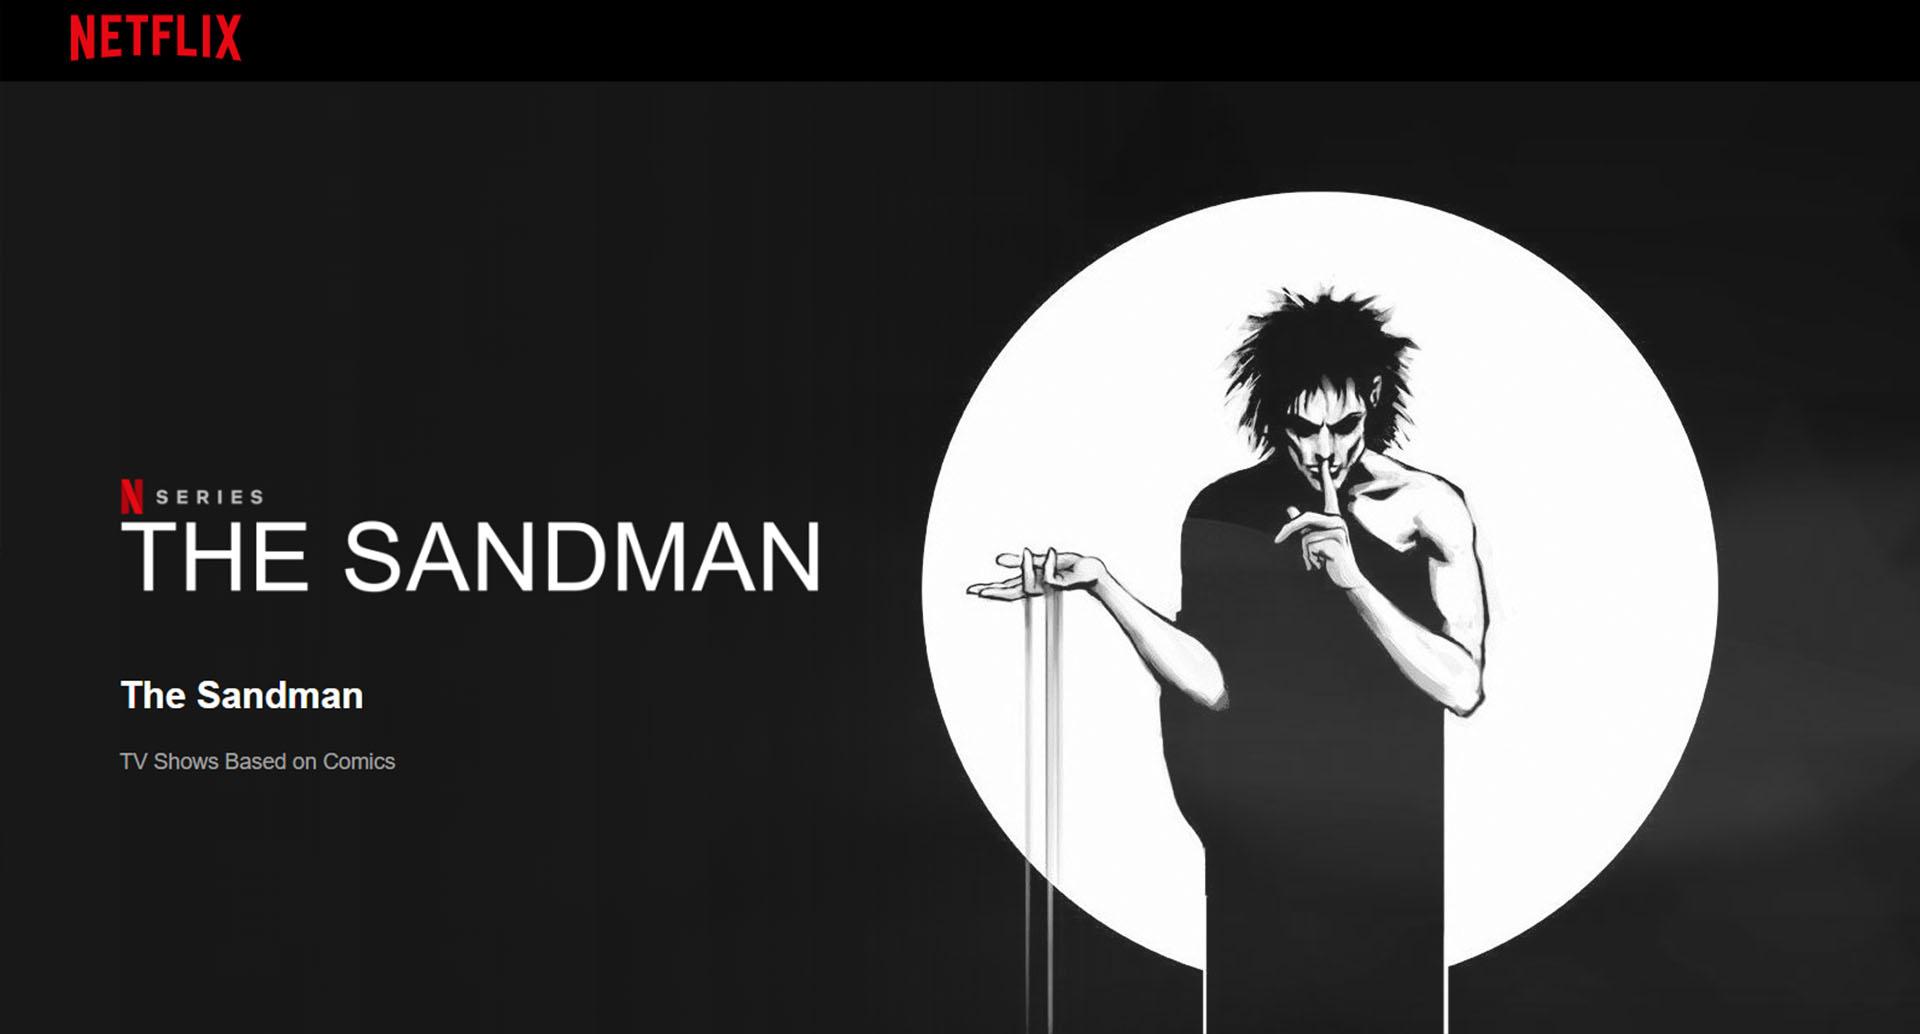 Netflix Neil Gaiman 'The Sandman' has been postponed indefinitely.